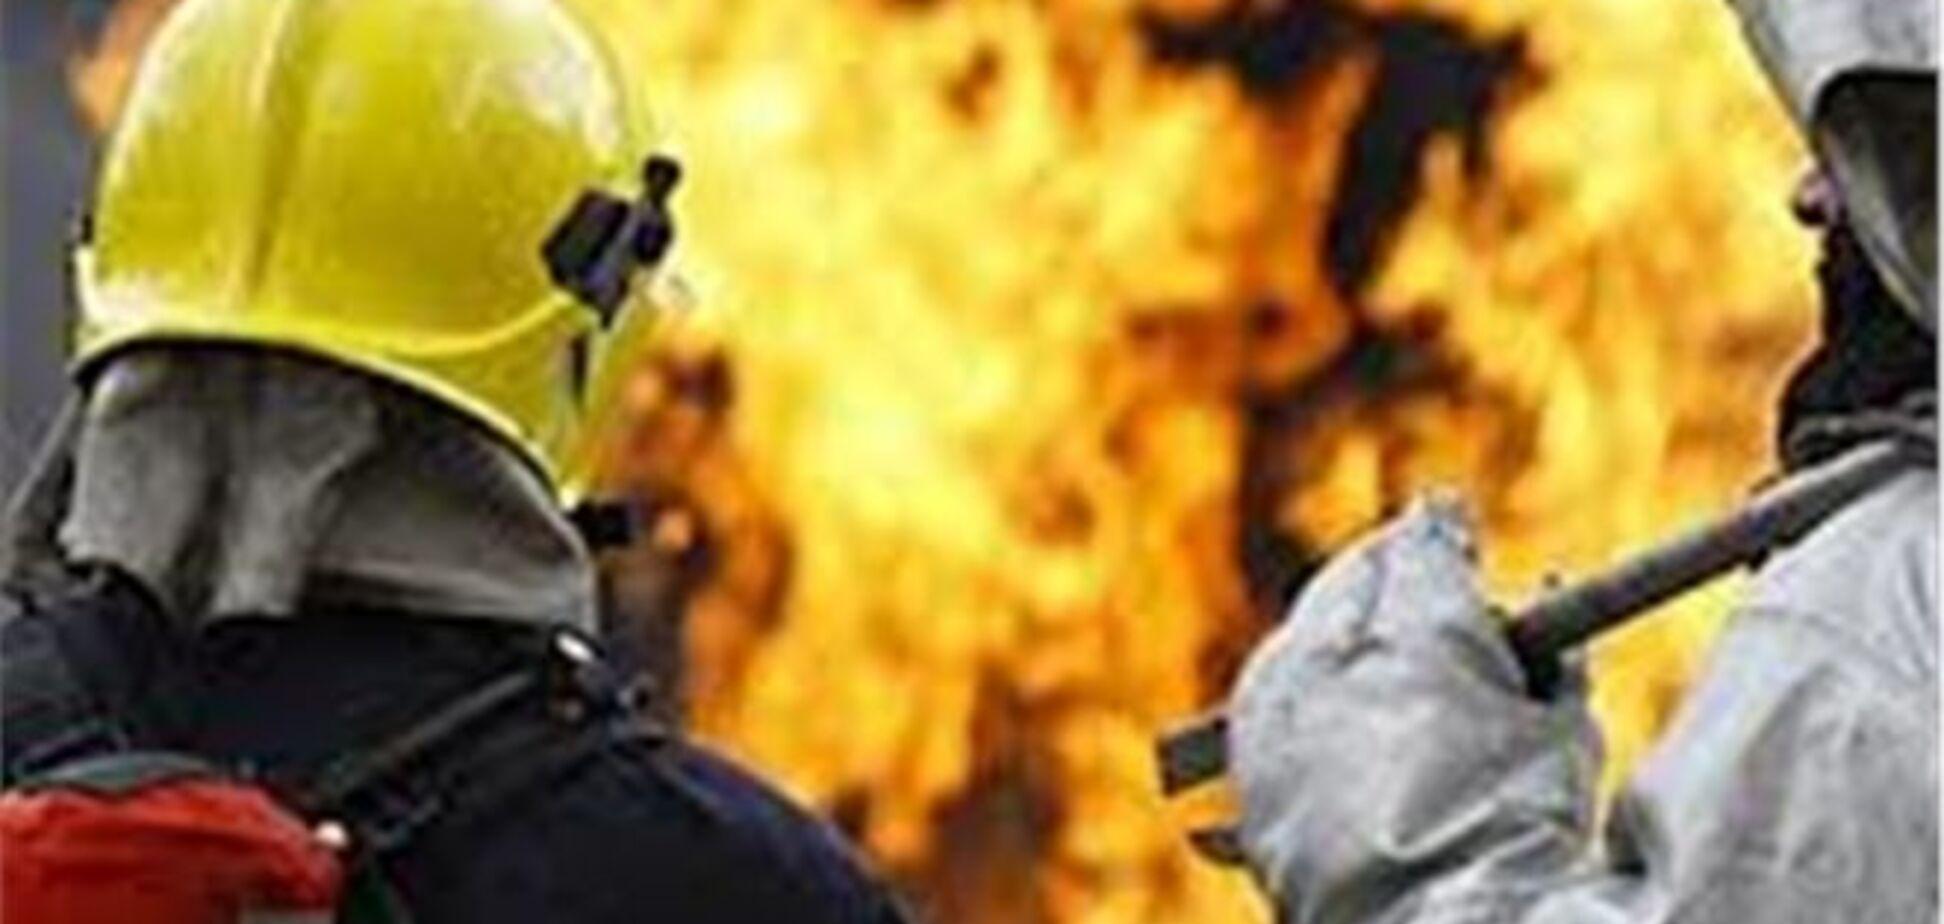 У Луганську стався вибух у житловому будинку